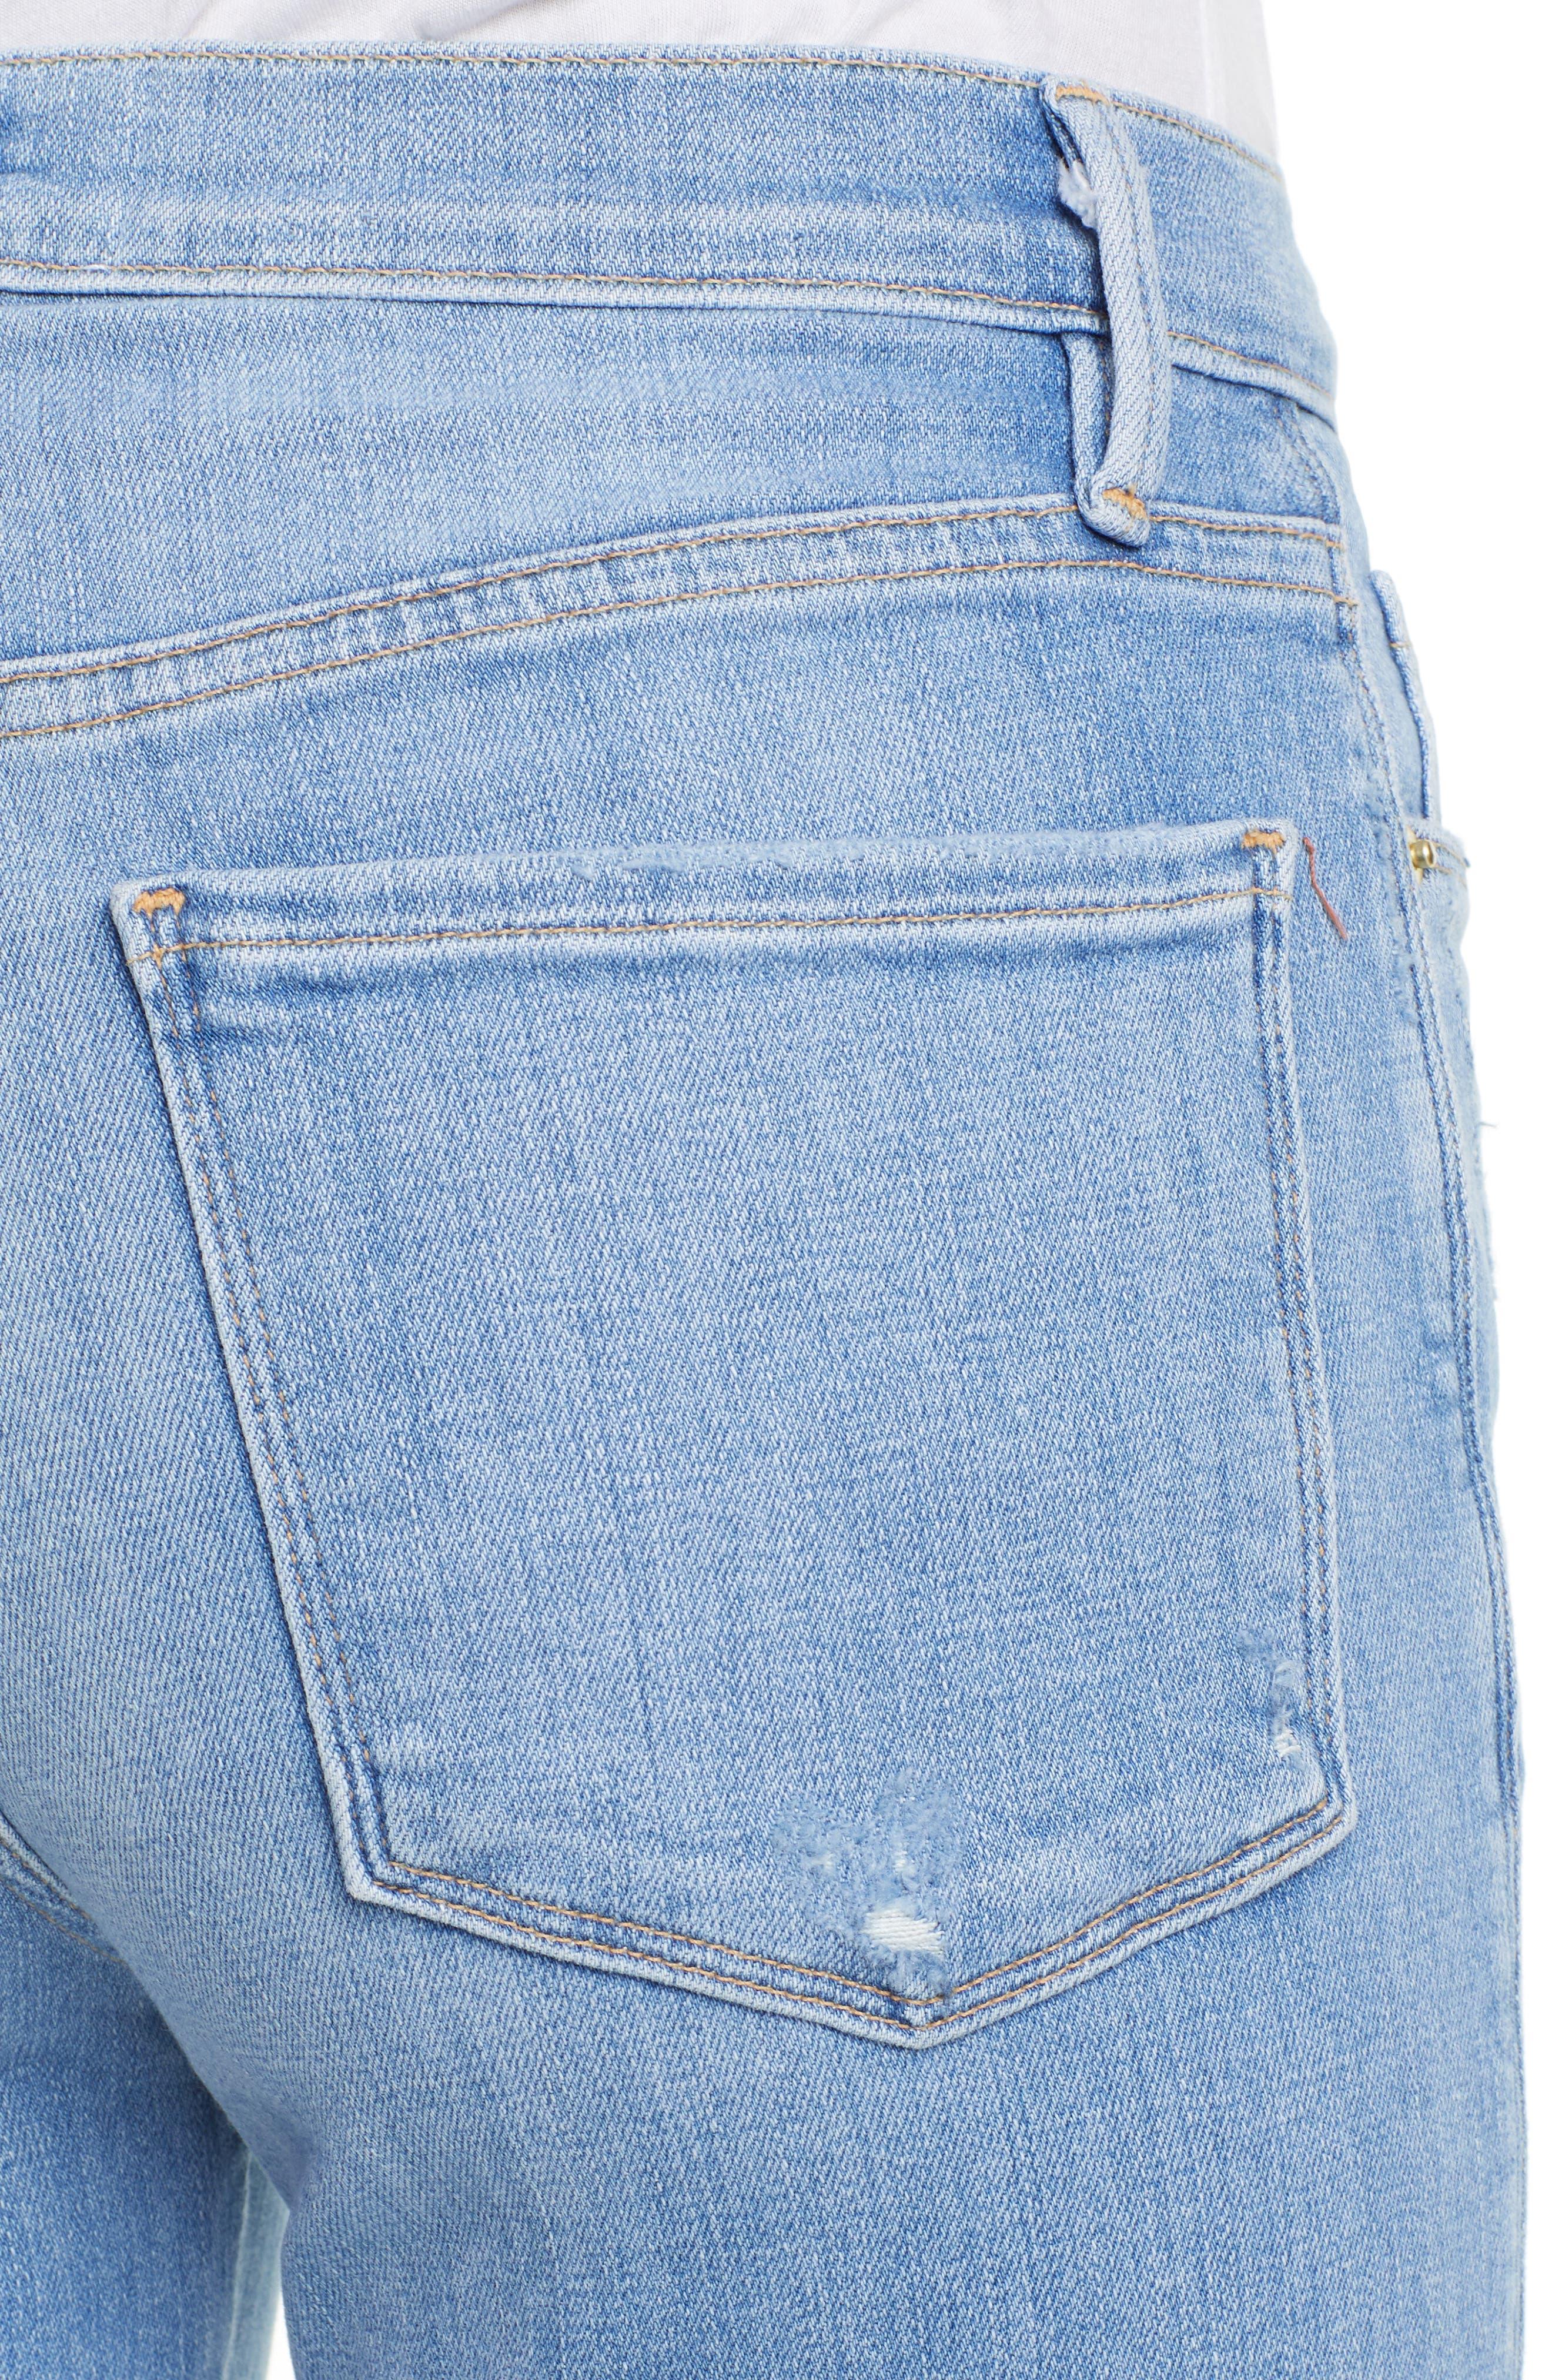 FRAME, Le Sylvie High Waist Raw Hem Straight Leg Jeans, Alternate thumbnail 5, color, OVERDRIVE